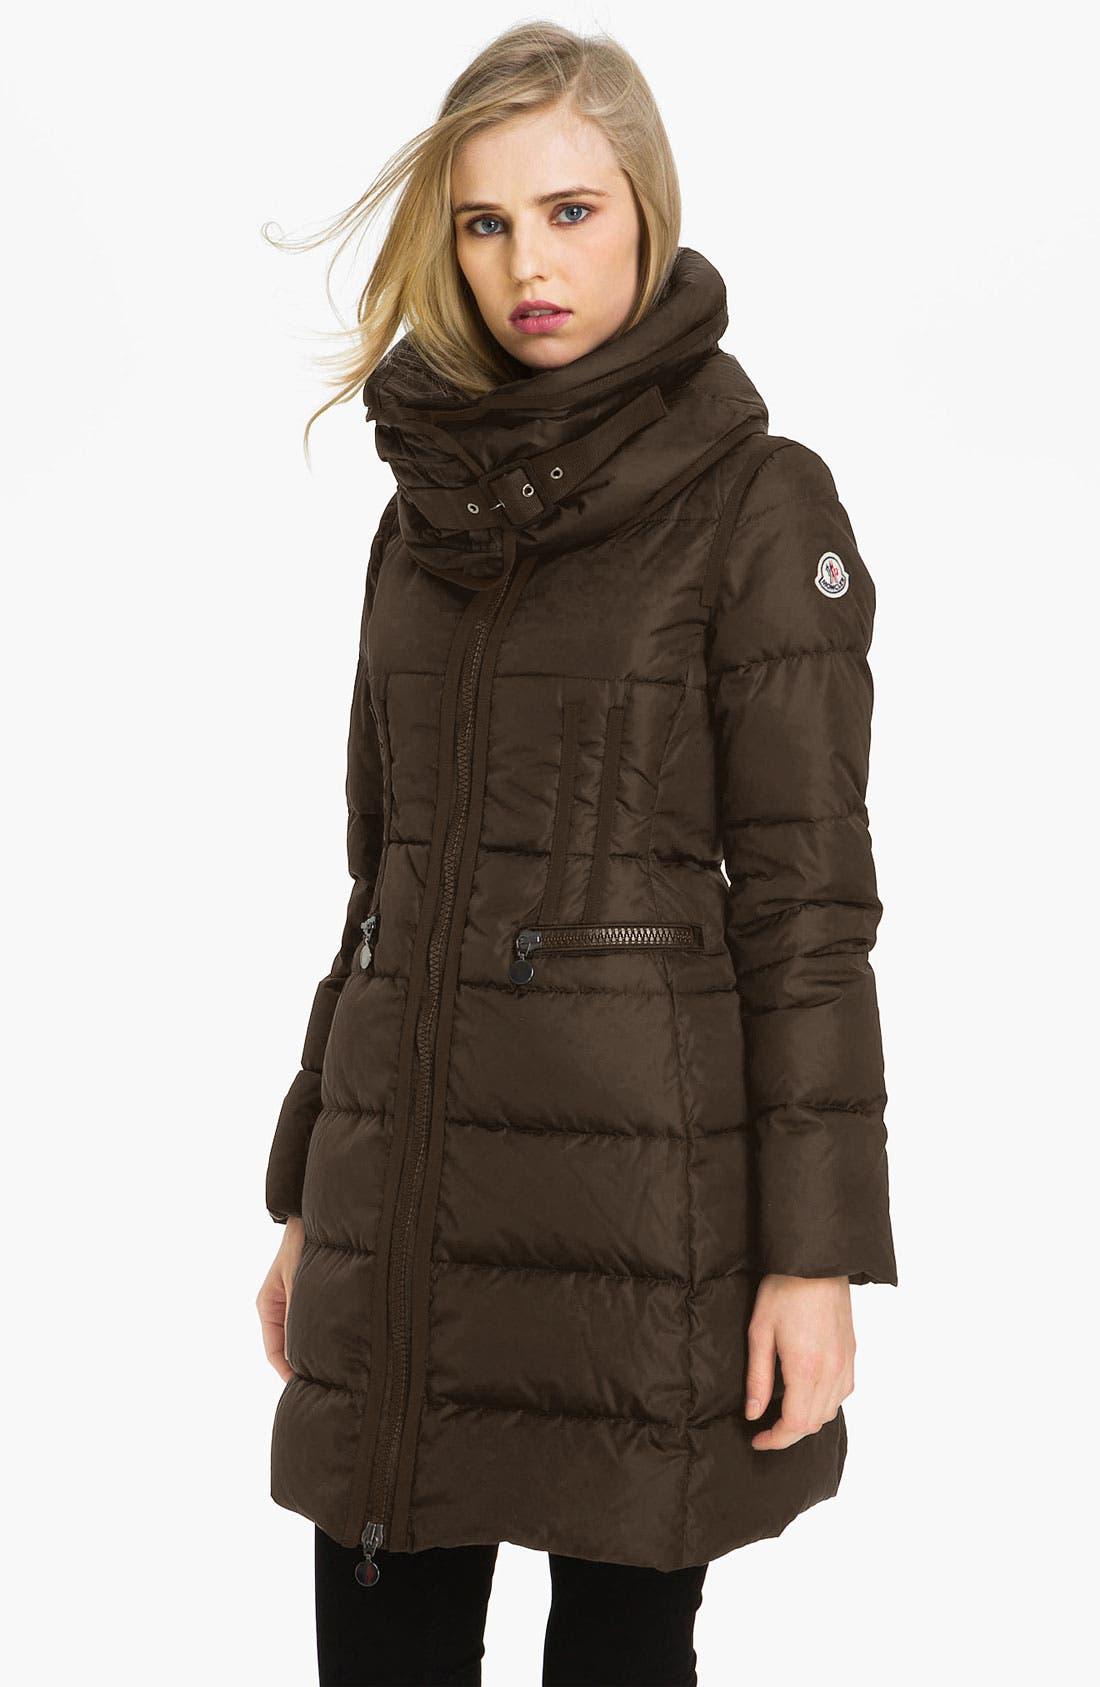 Alternate Image 1 Selected - Moncler 'Chou' Zip Pocket Down Coat